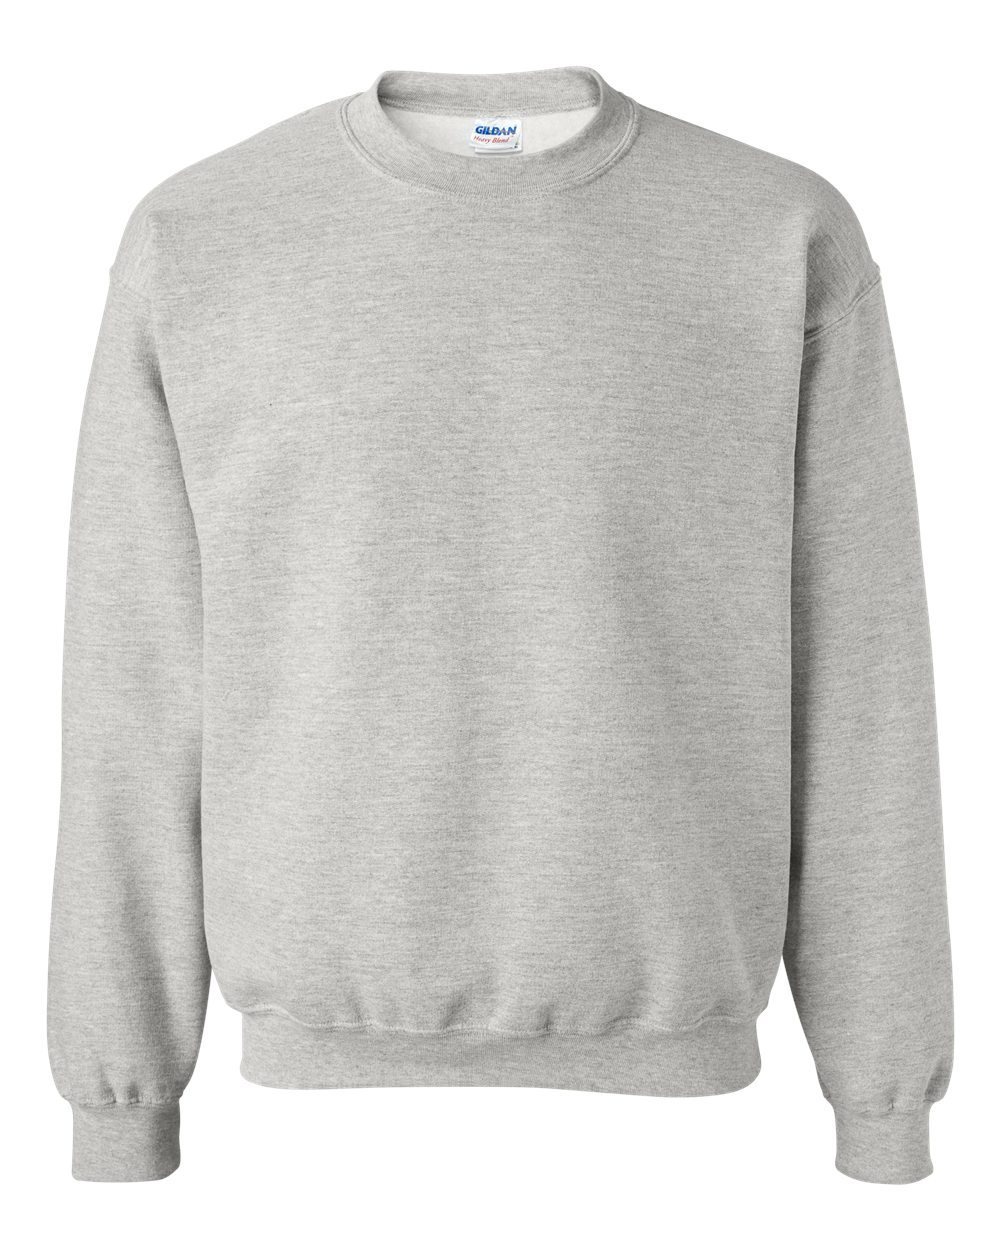 Gildan Heavy Blend Crewneck Sweatshirt, Ash Grey, XL